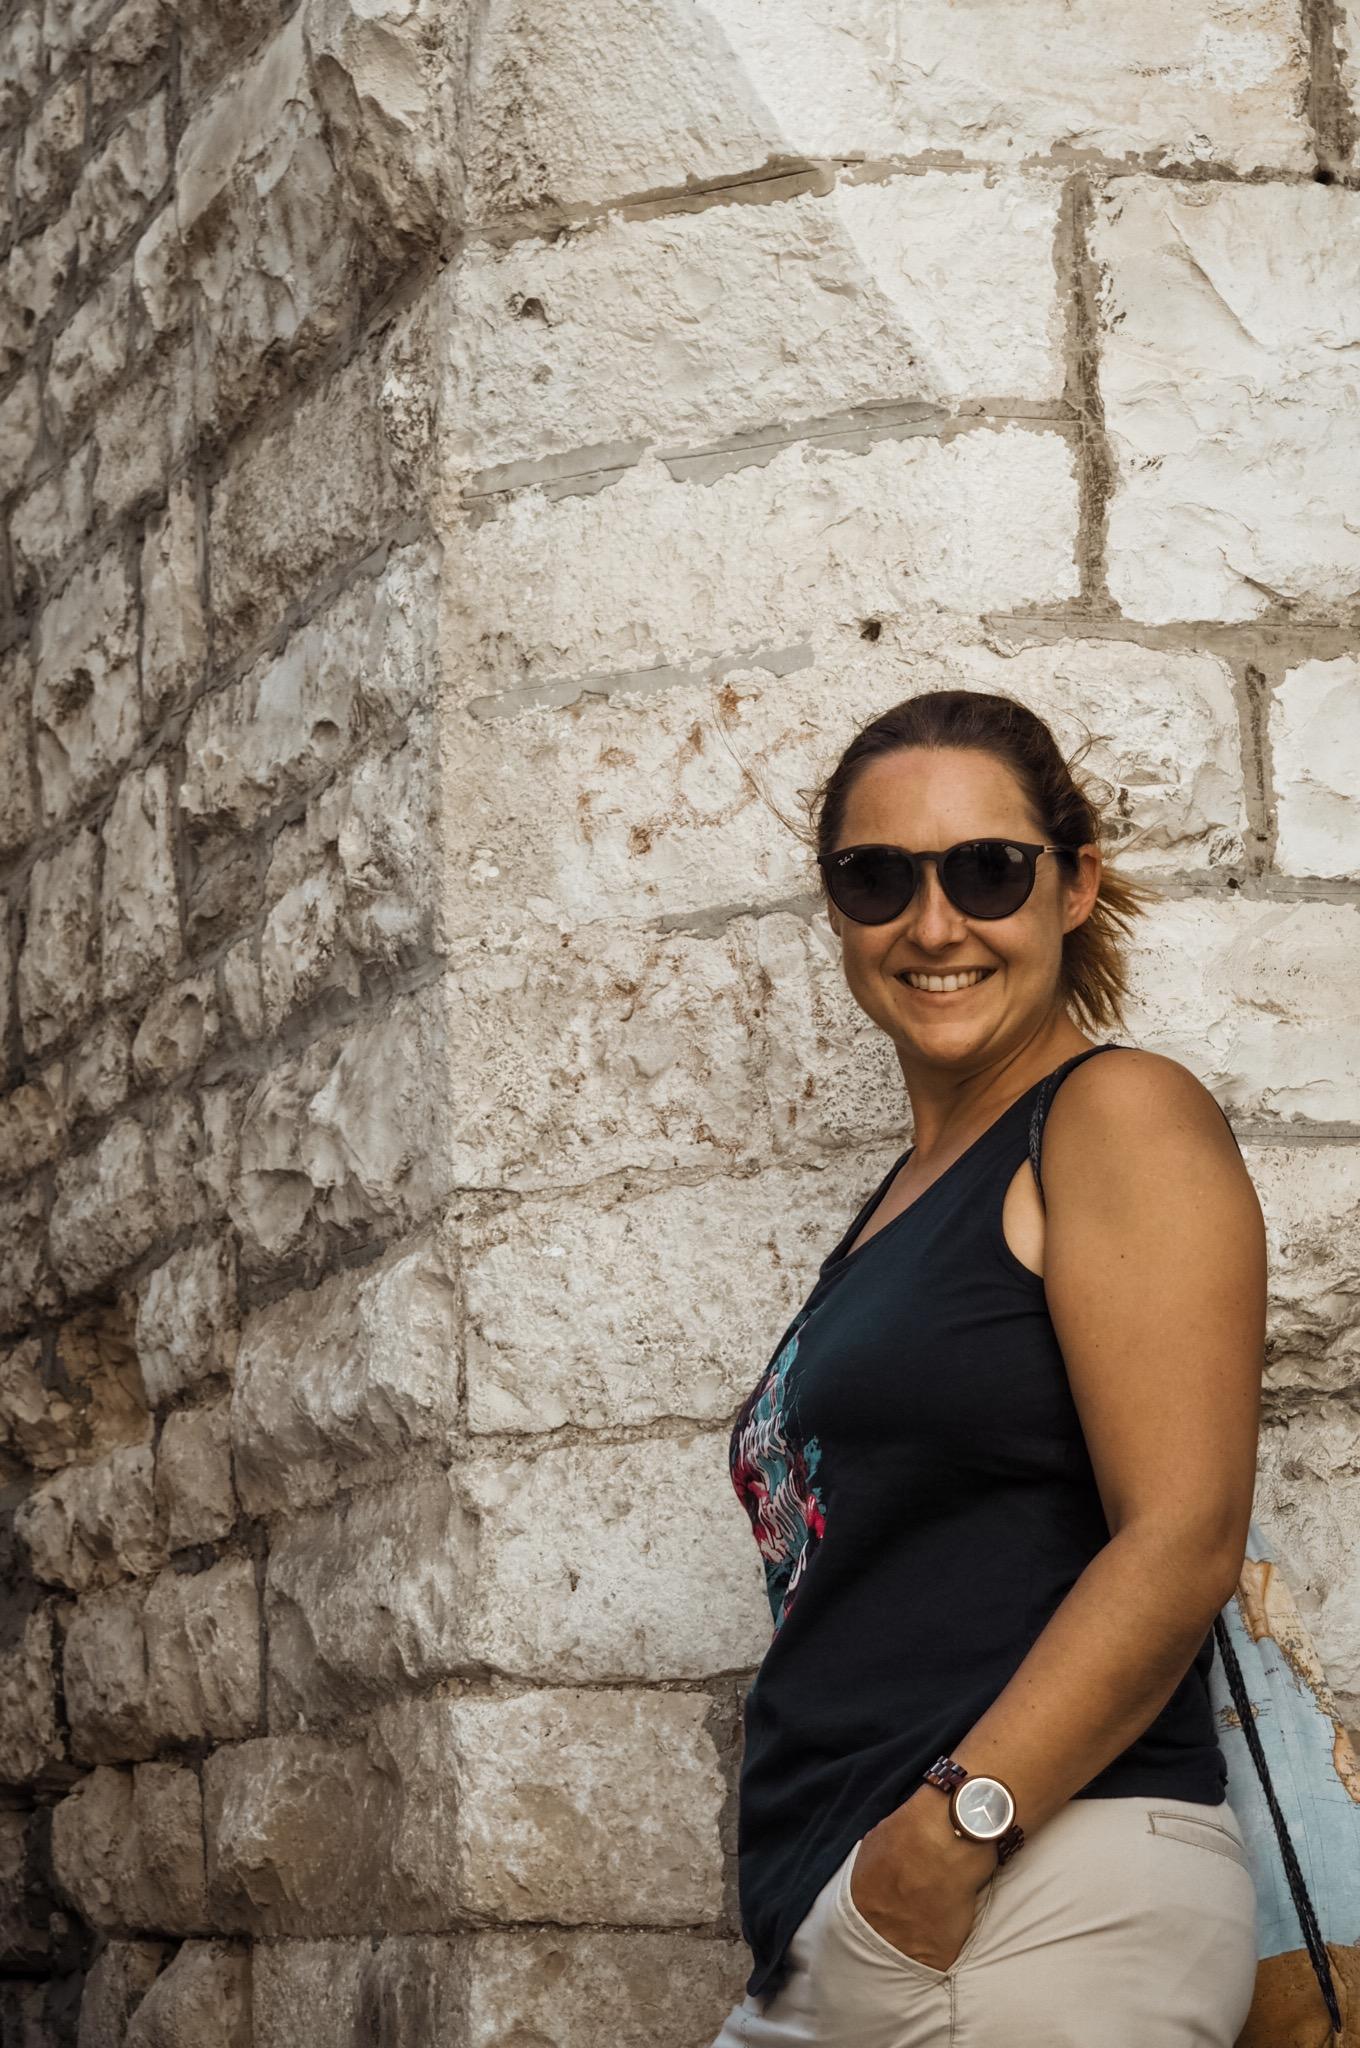 Hafen-Bari-Sightseeing